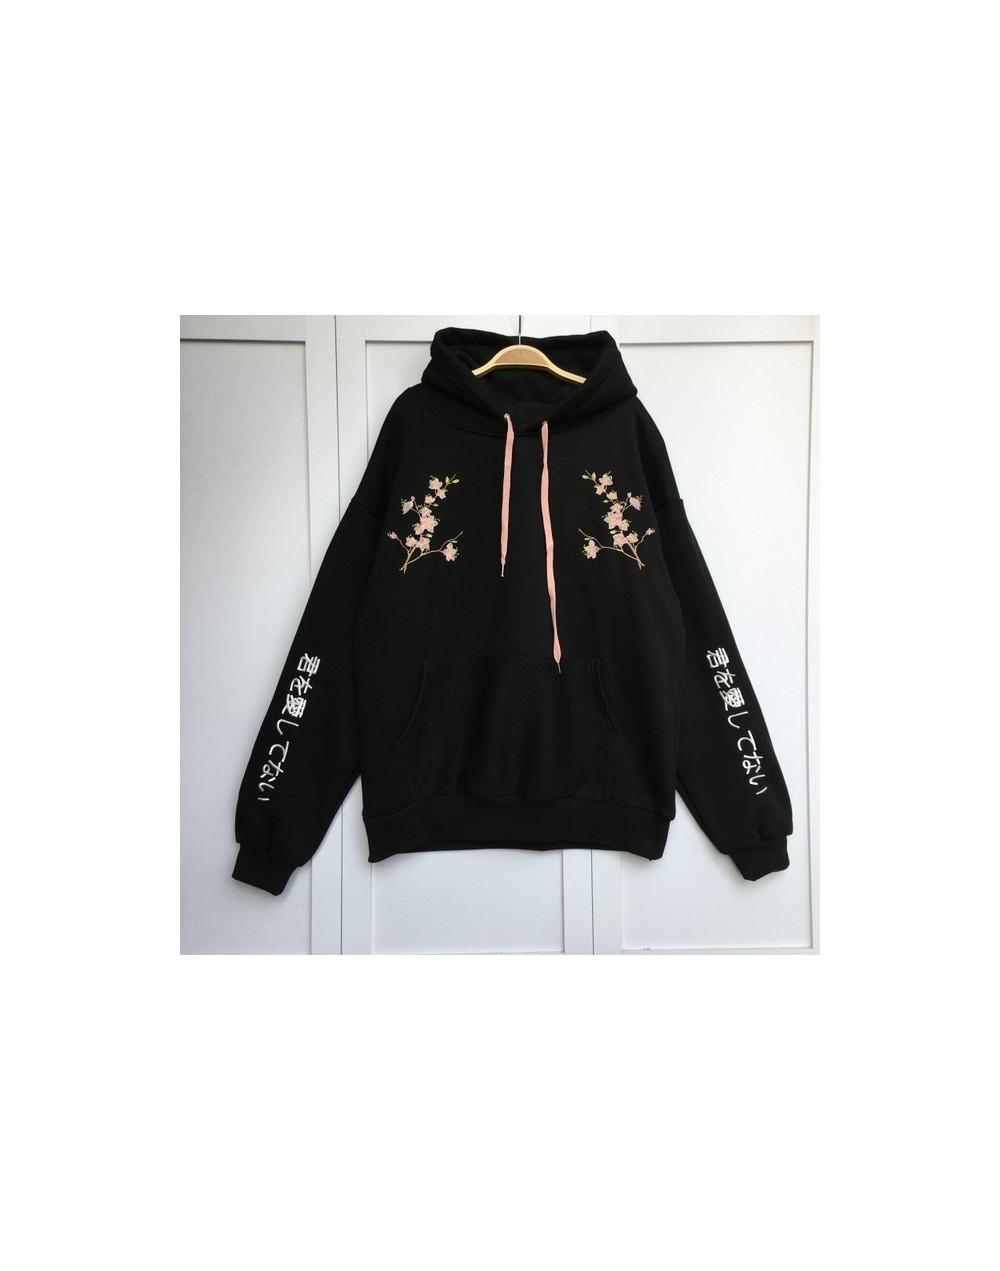 Korean Preppy Style Women Hoodies 2019 New Flower Embroidery Pullovers Casual Loose Thick Hoody Warm Coat Sweatshirt 64087 -...